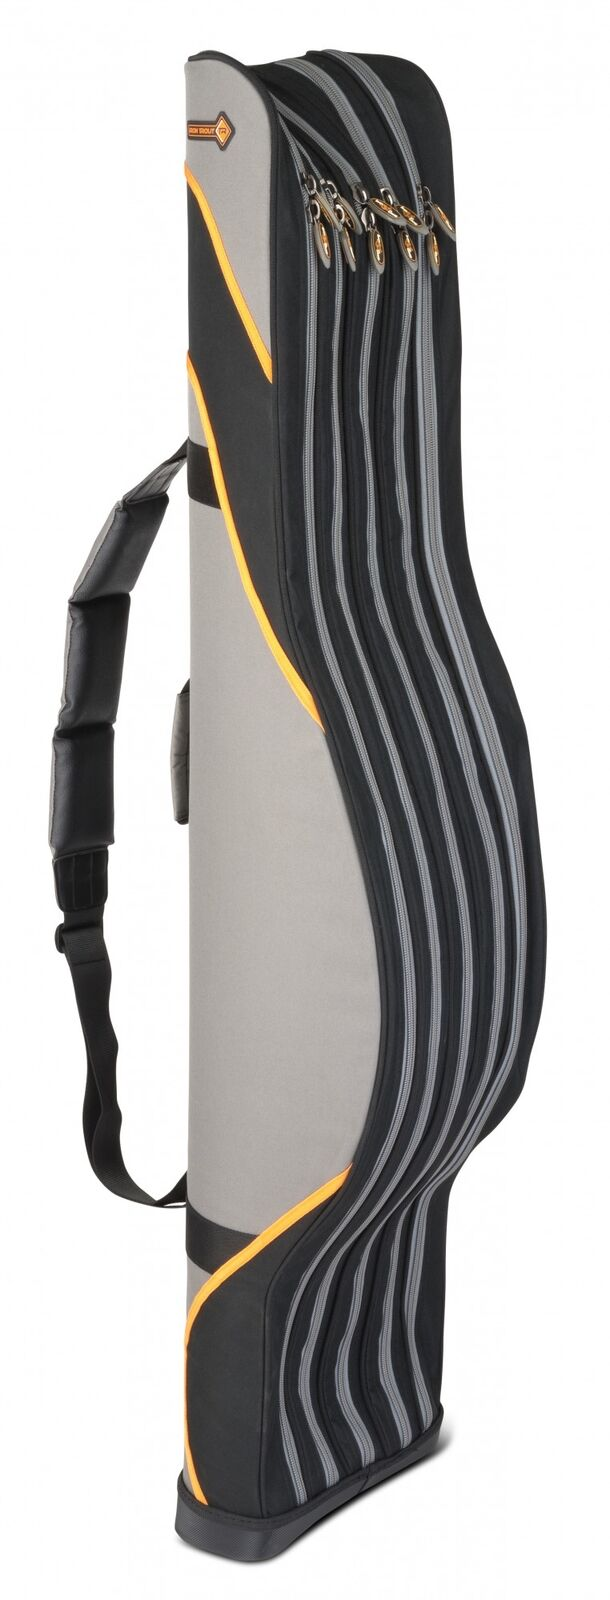 Iron  trout magnum rod bag fish ruten-FU-t-teral 155cm 5-Fach  creative products